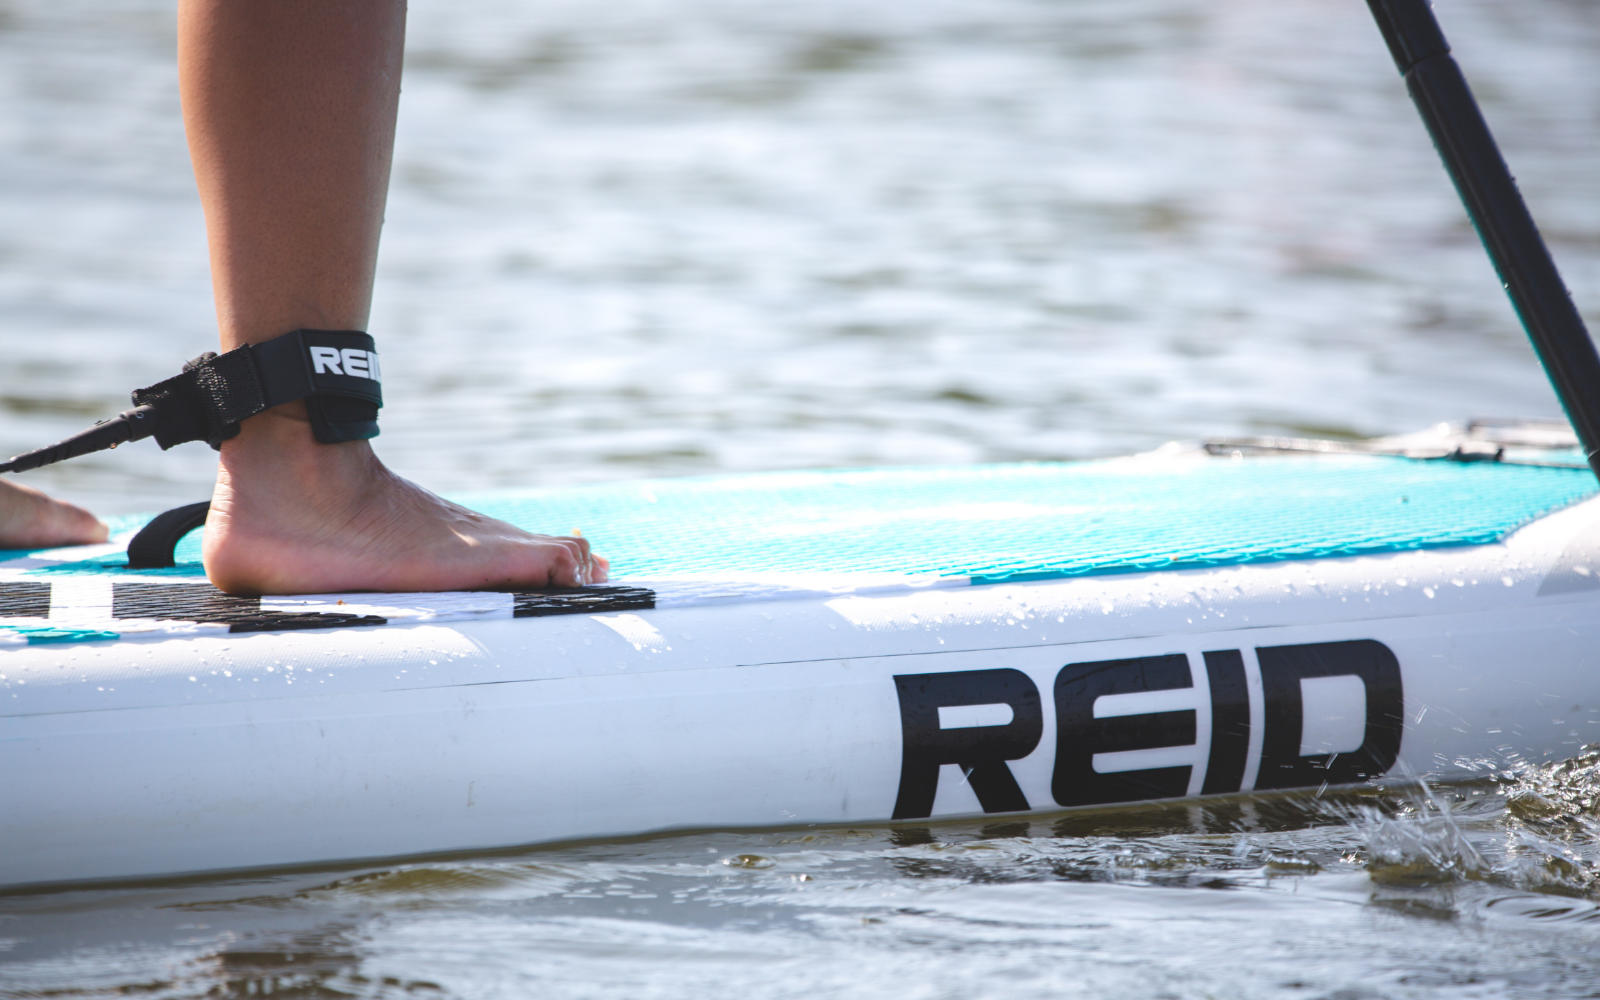 14 4 - Reid ® - Reid Waikiki 10'6 Paddleboard